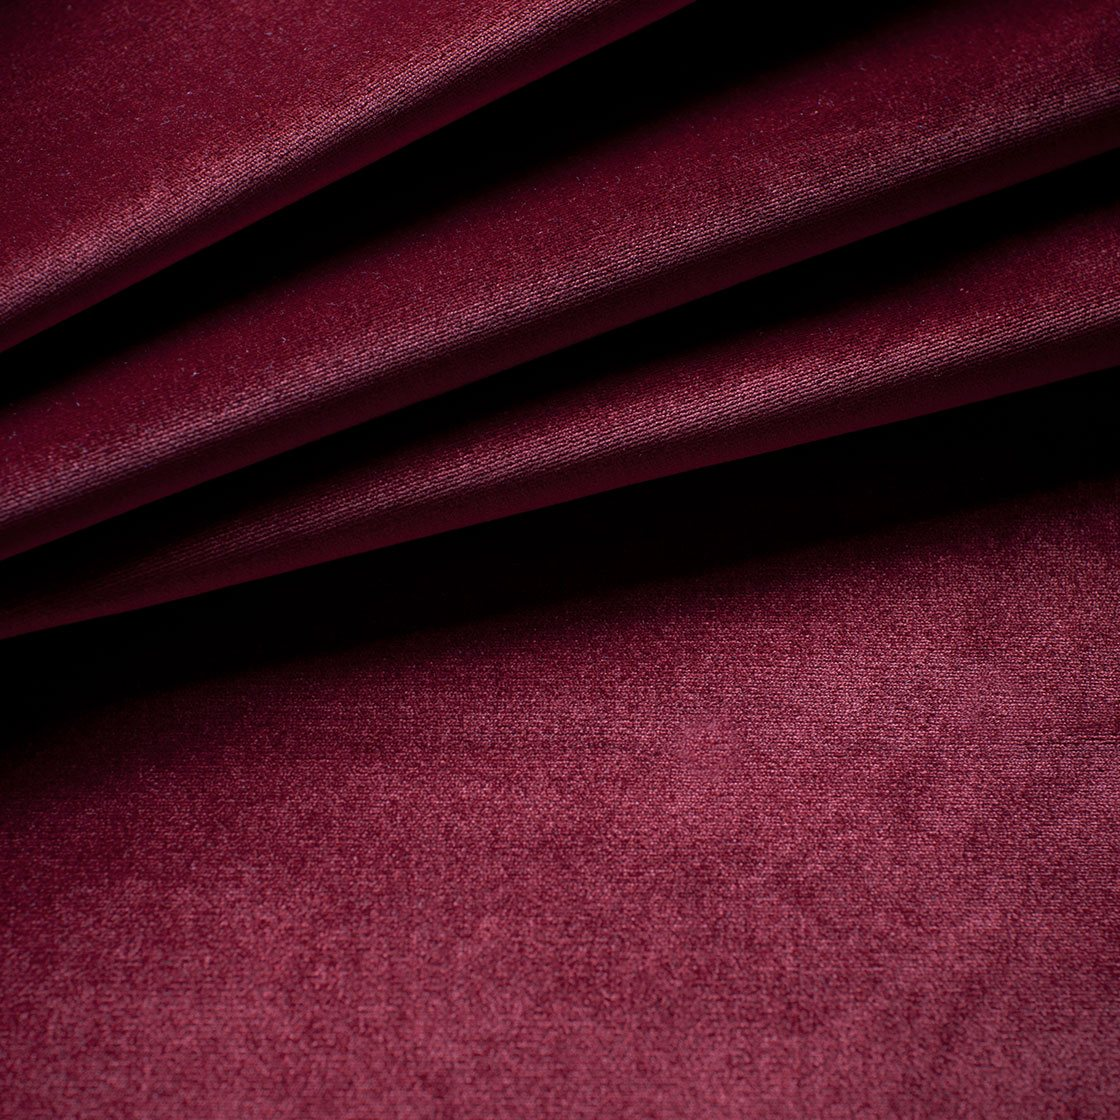 Capri Silk Velvet - Peony - Beaumont & Fletcher - Beaumont & Fletcher